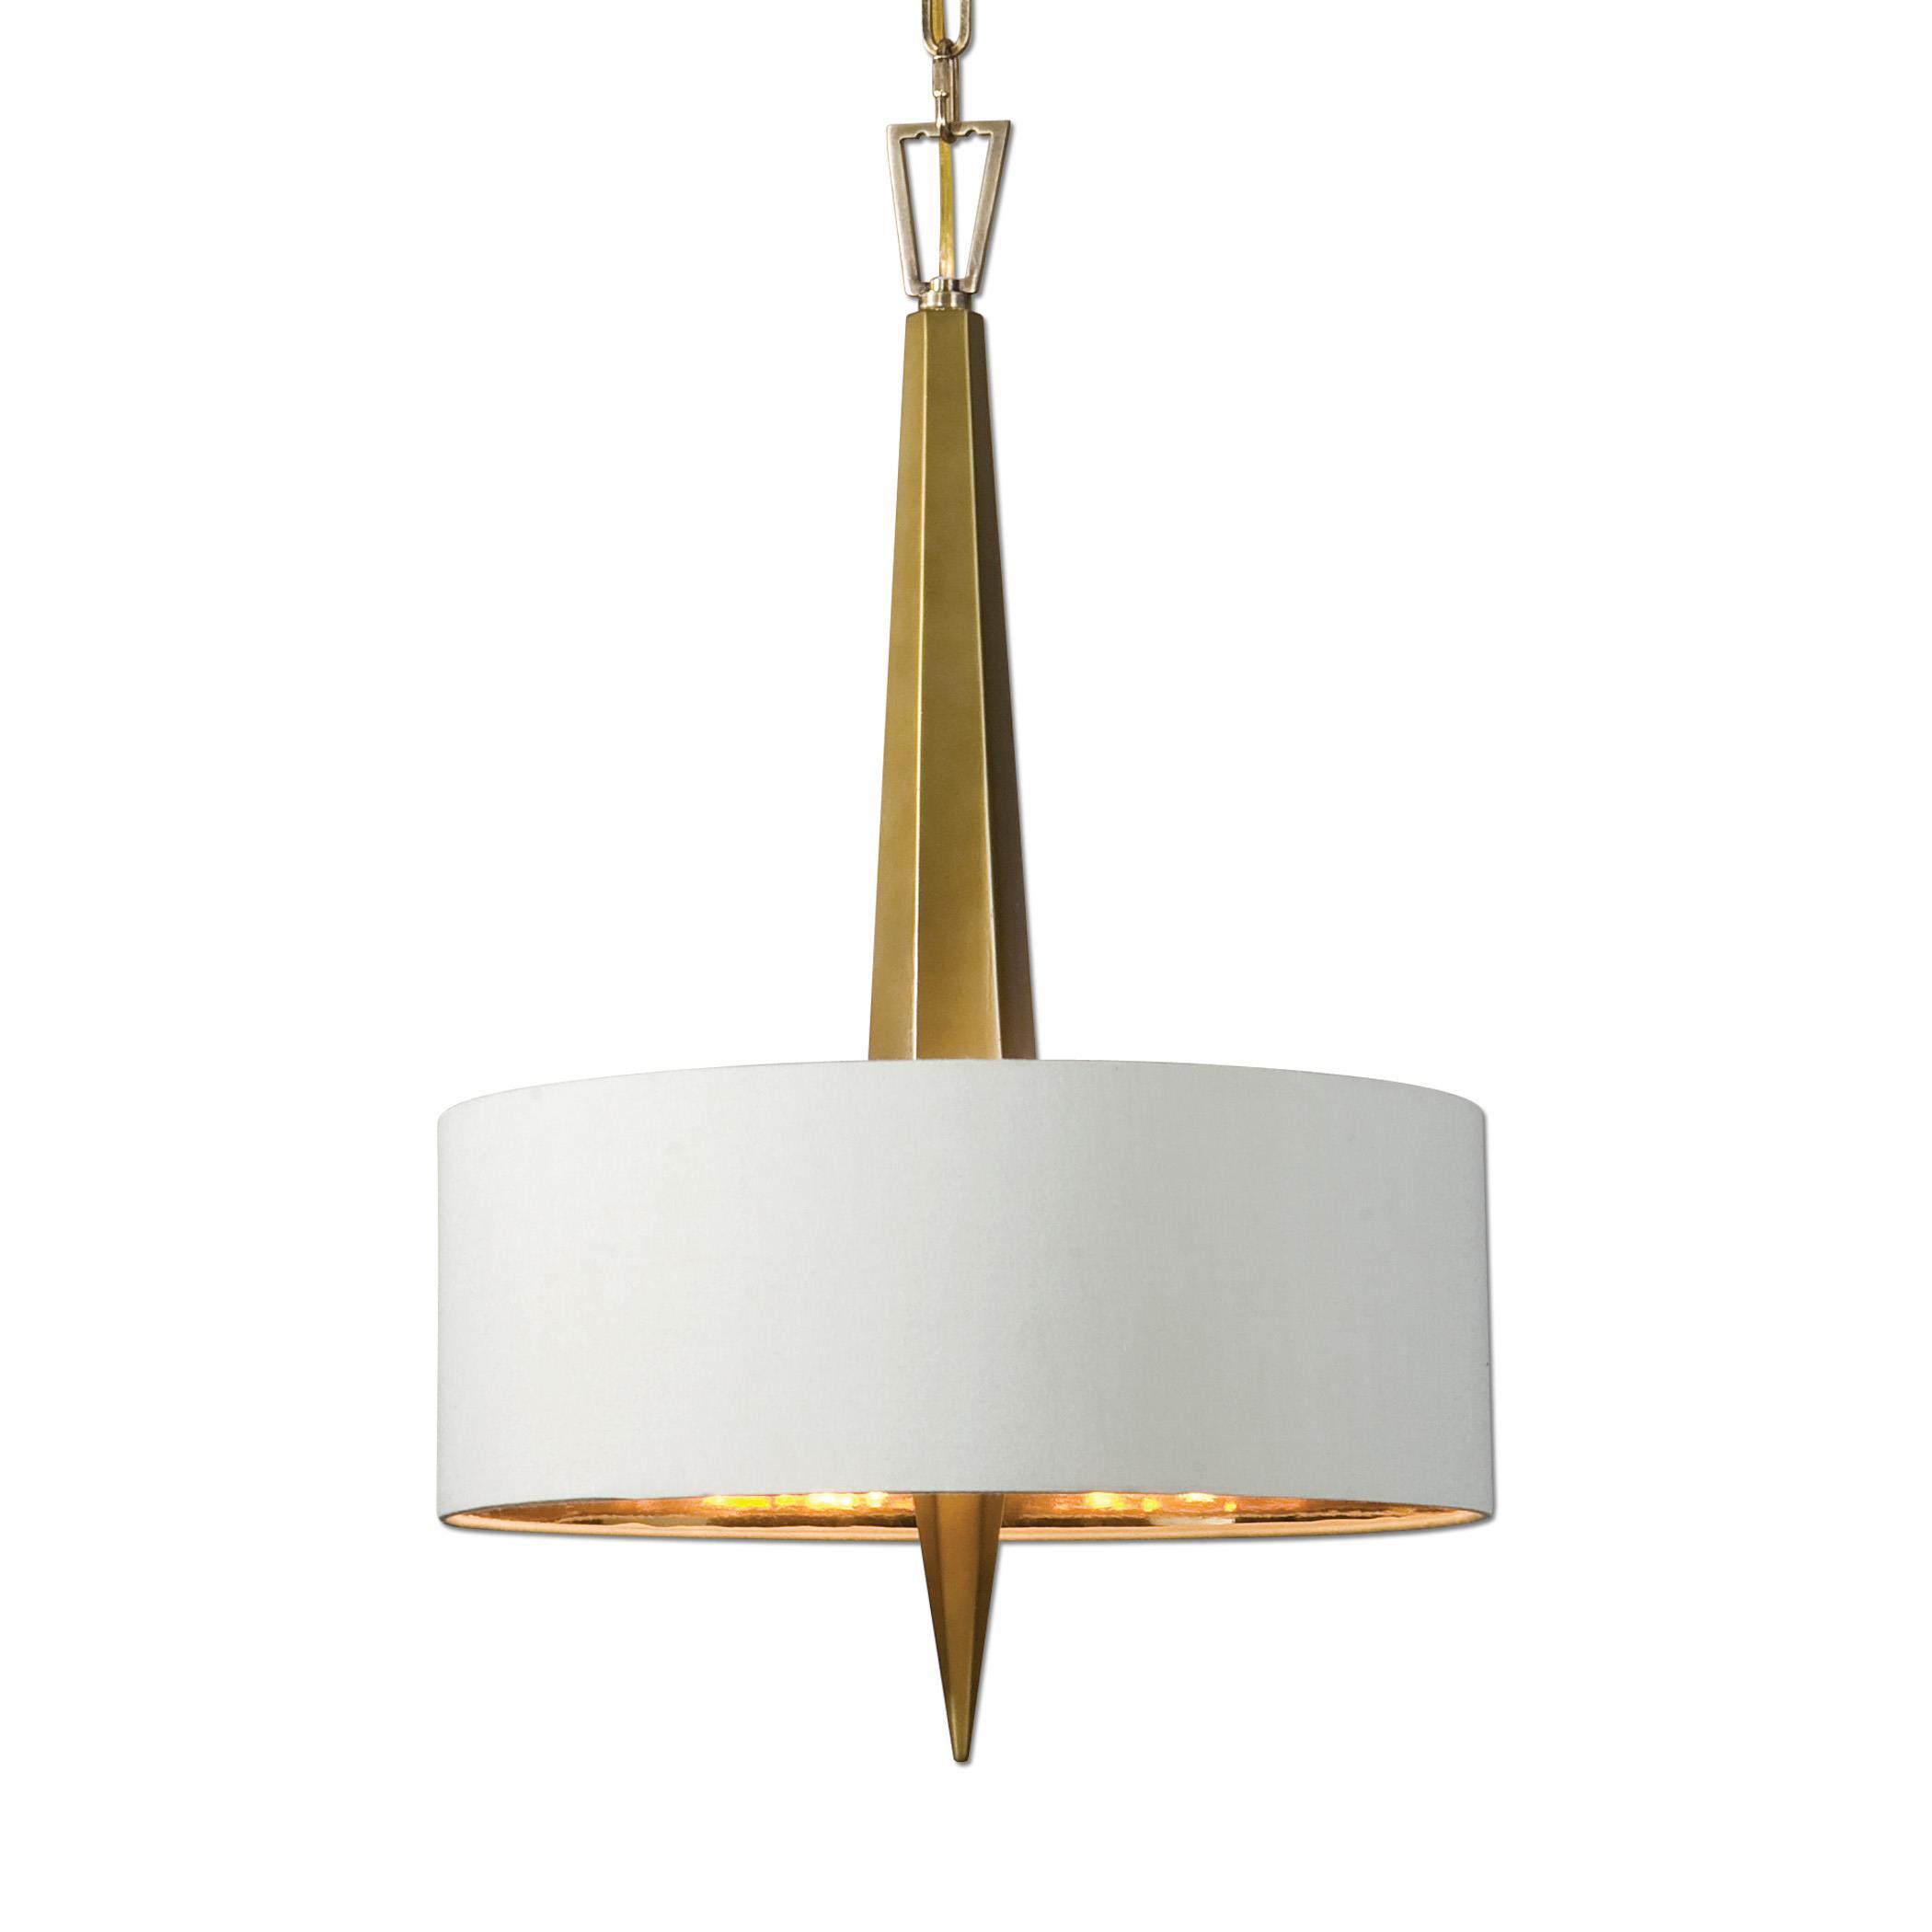 Uttermost Lighting Fixtures Obeliska 3 Light Gold Chandelier - Item Number: 21264